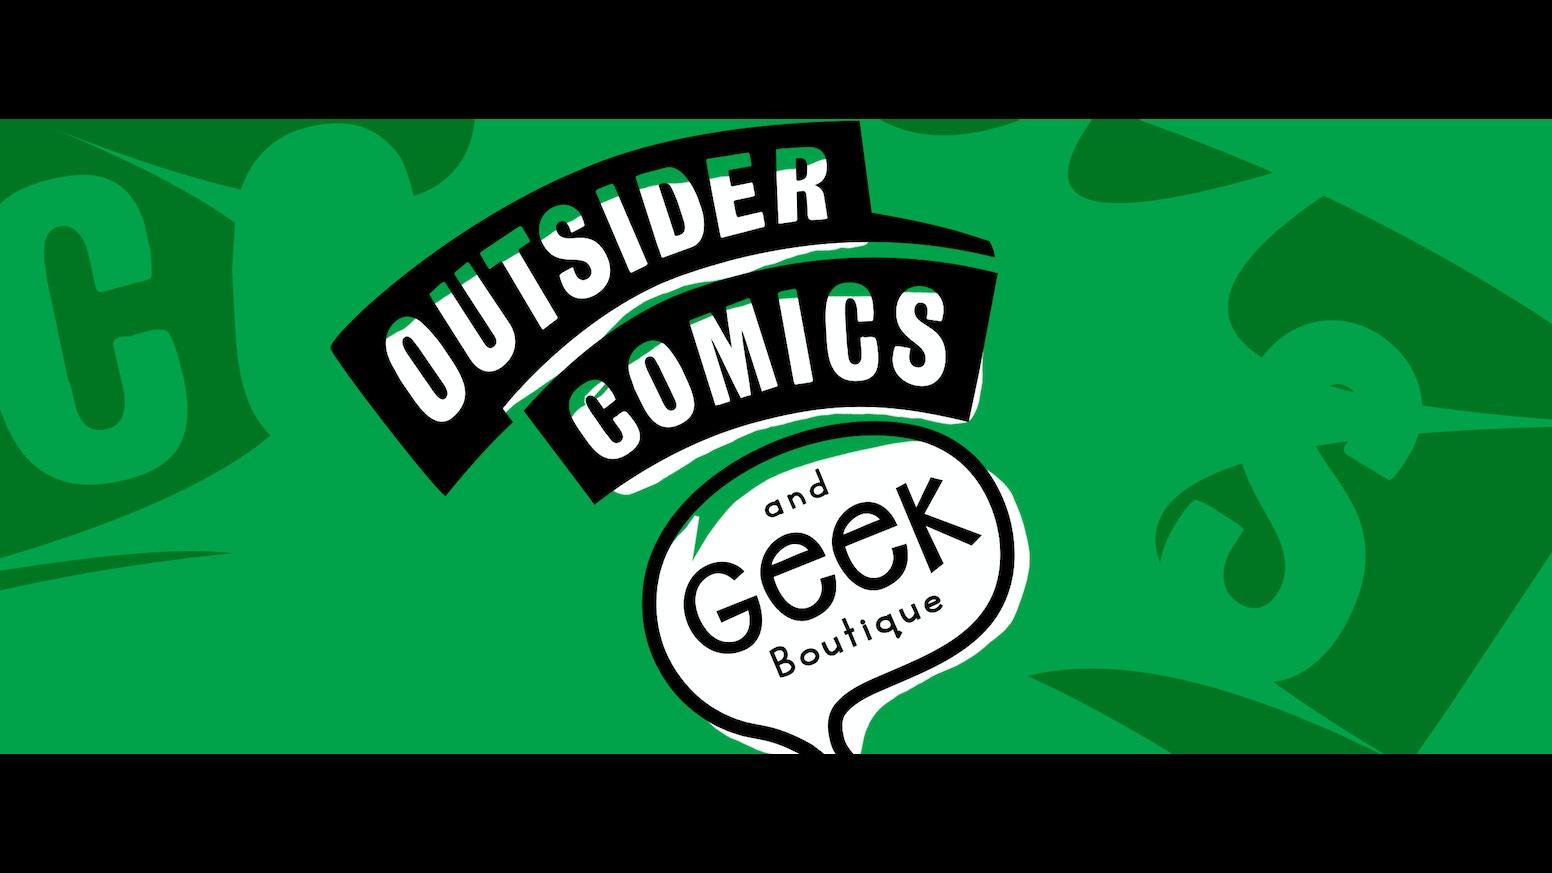 outsider comics and geek boutique by jill taplin kickstarter. Black Bedroom Furniture Sets. Home Design Ideas